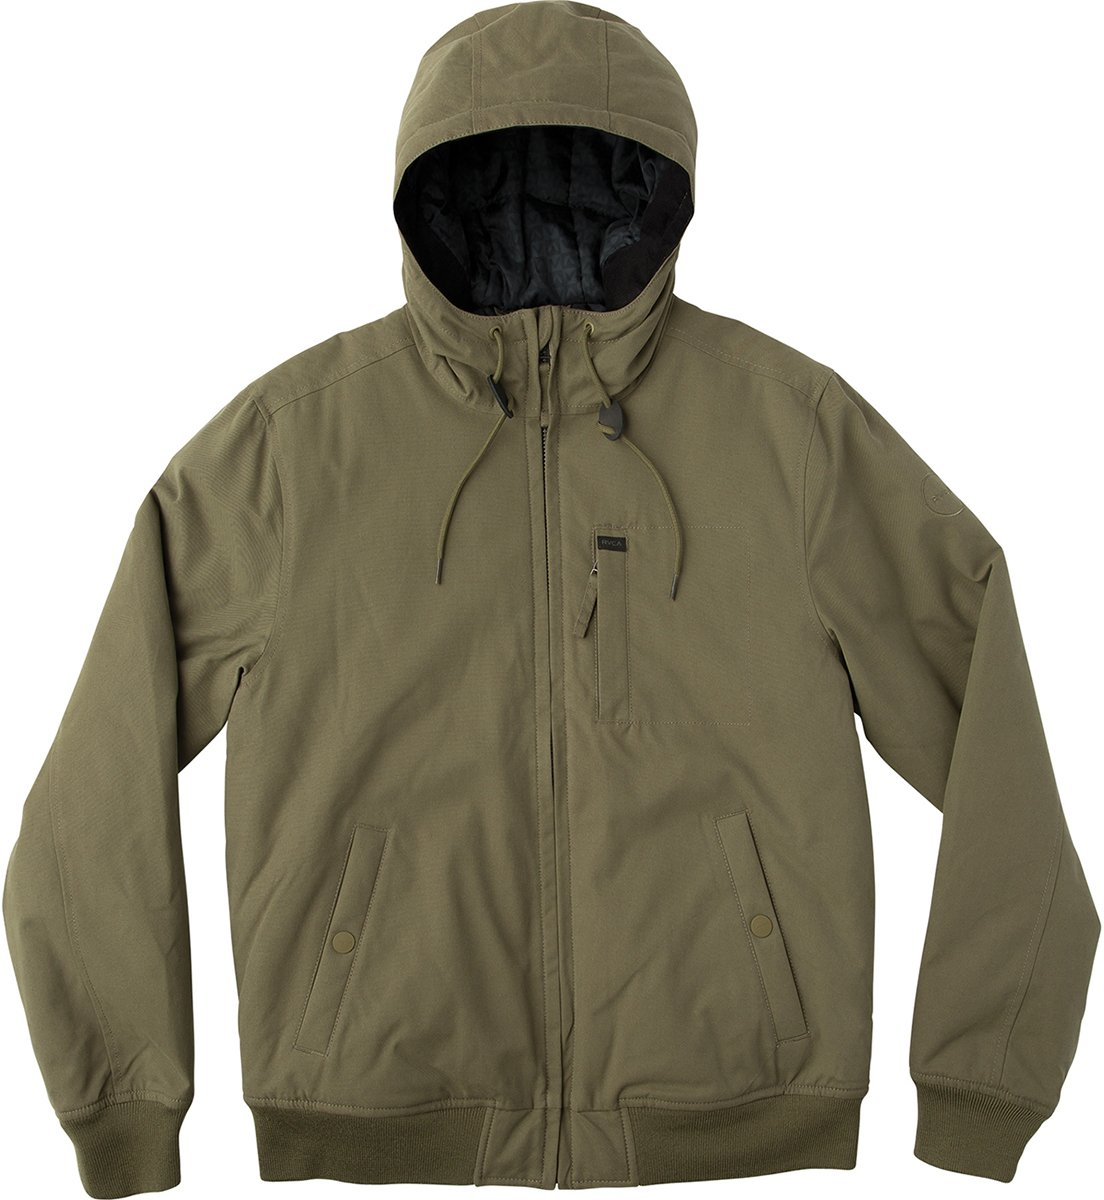 RVCA Men's Hooded Bomber Jacket, Burnt Olive, M